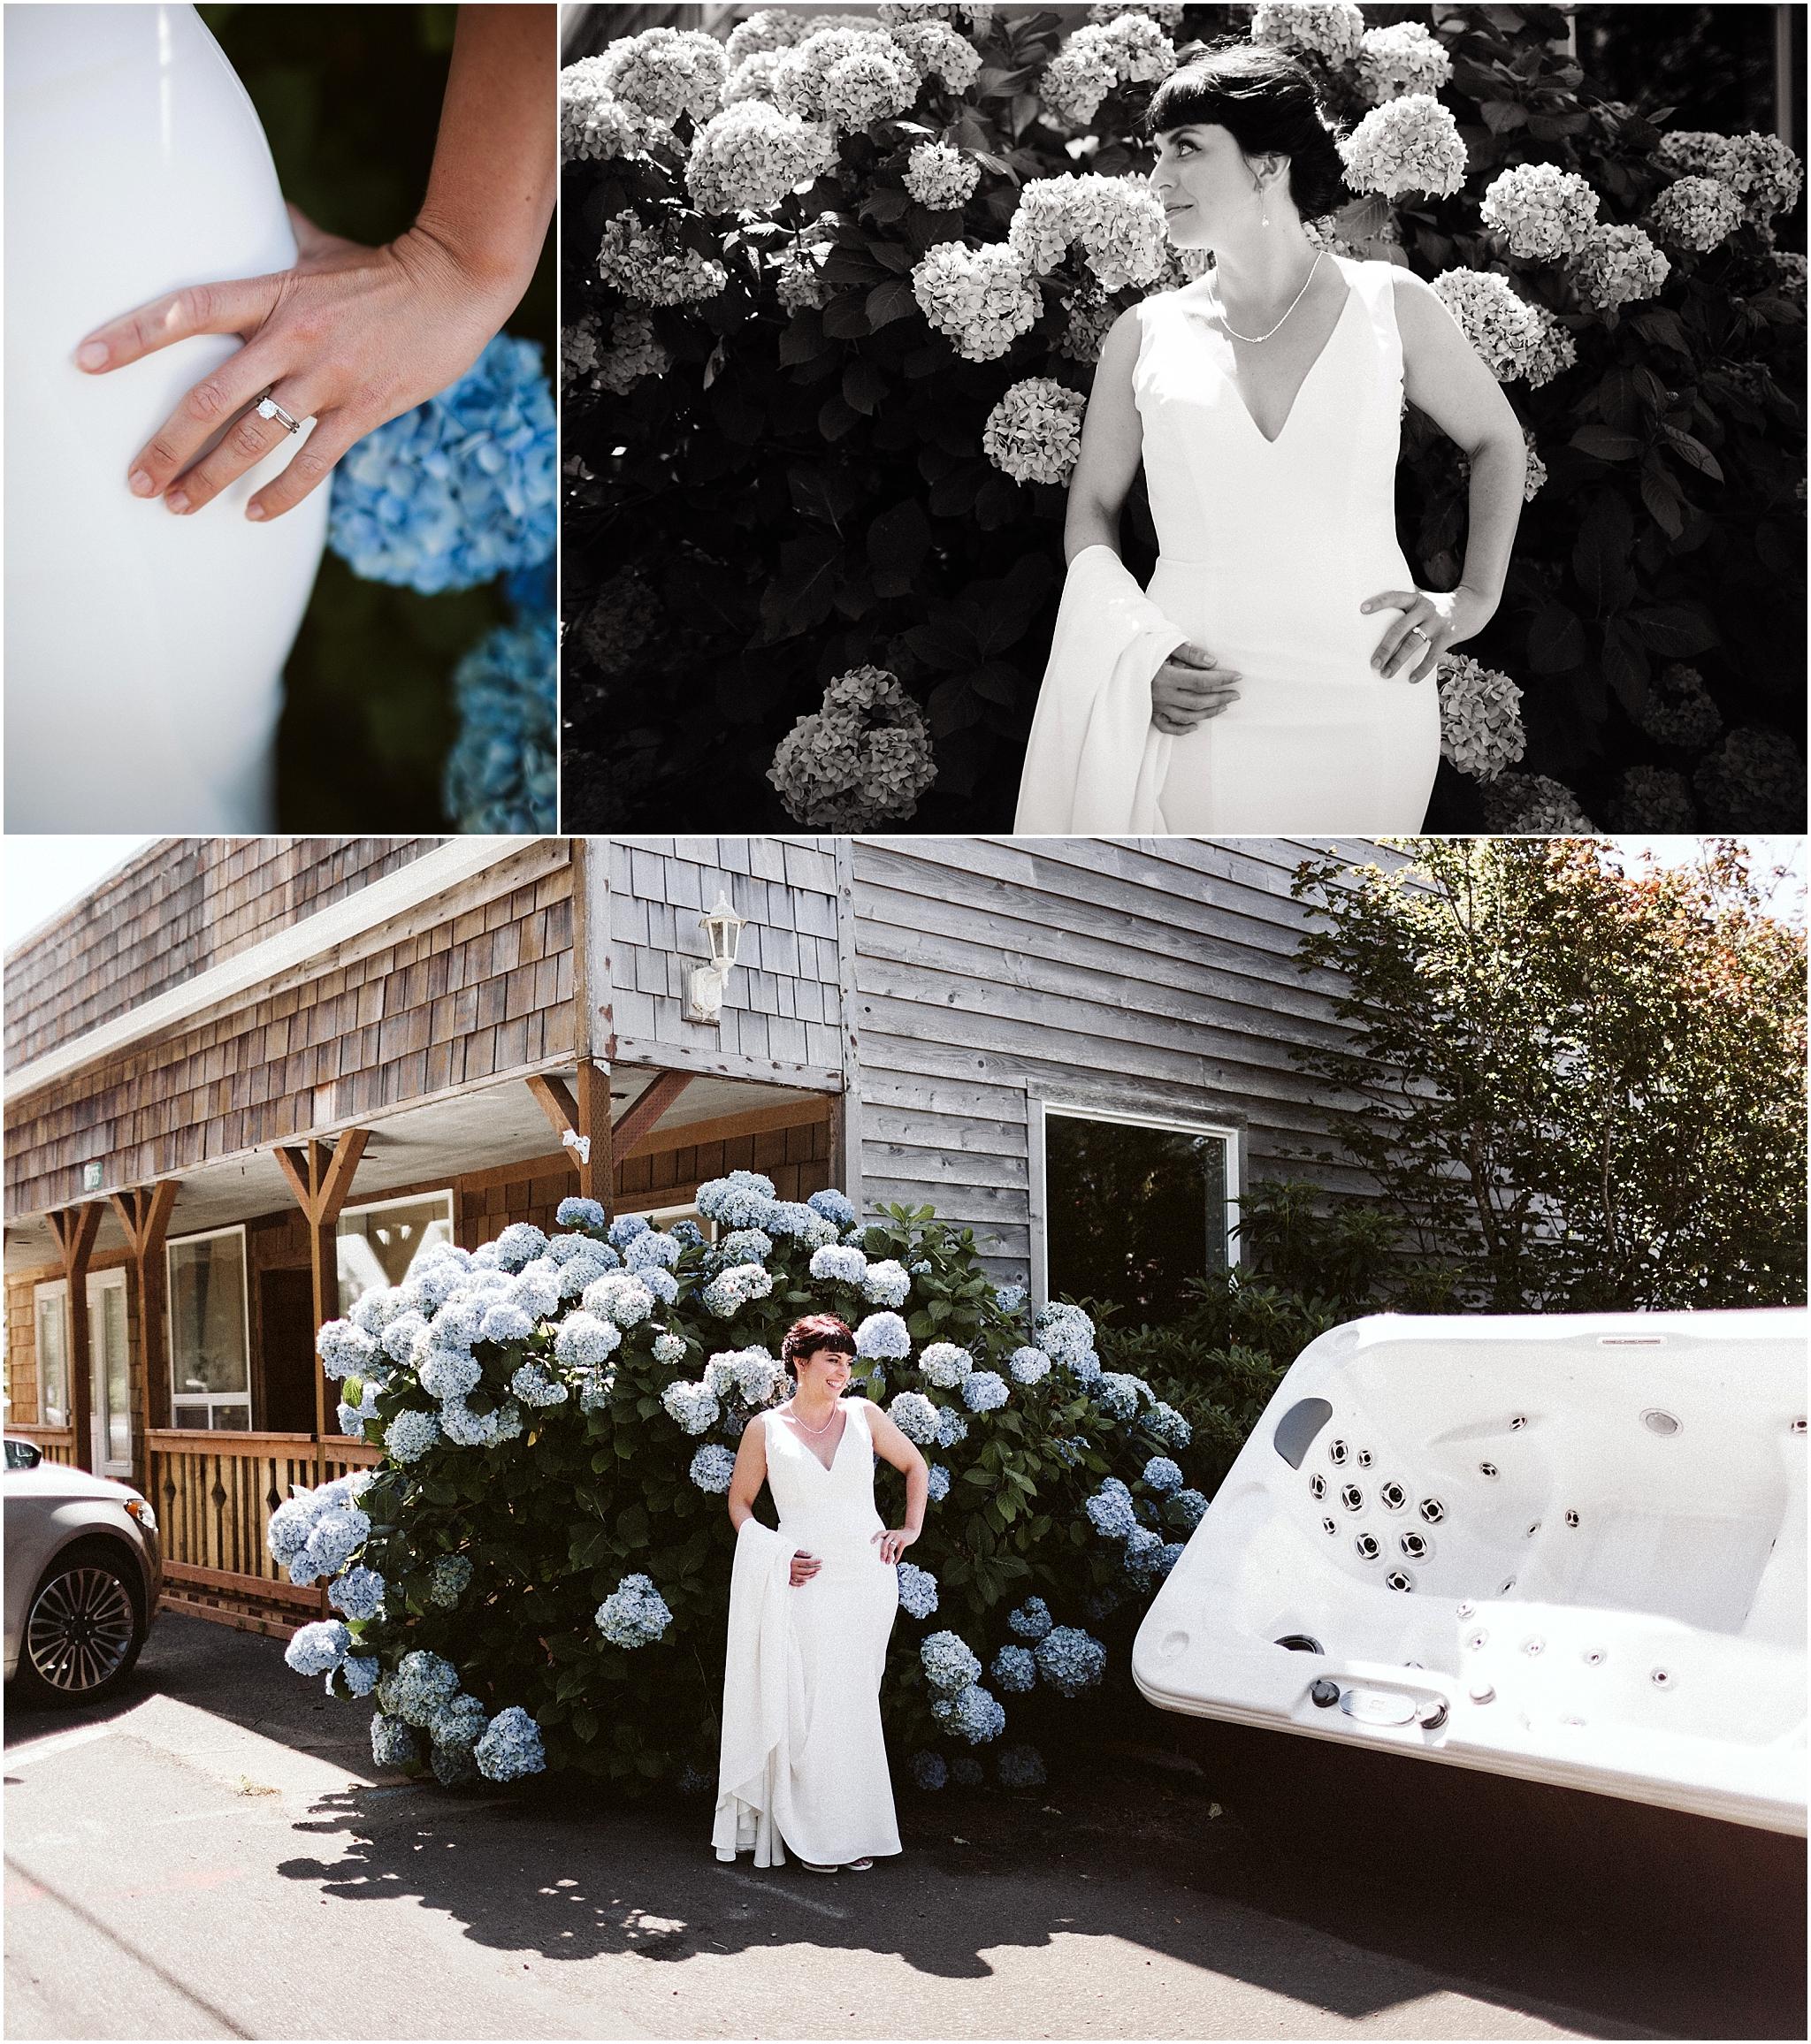 Oregon Coast Intimate Wedding | oregon elopement photographer | oregon elopement1.jpg